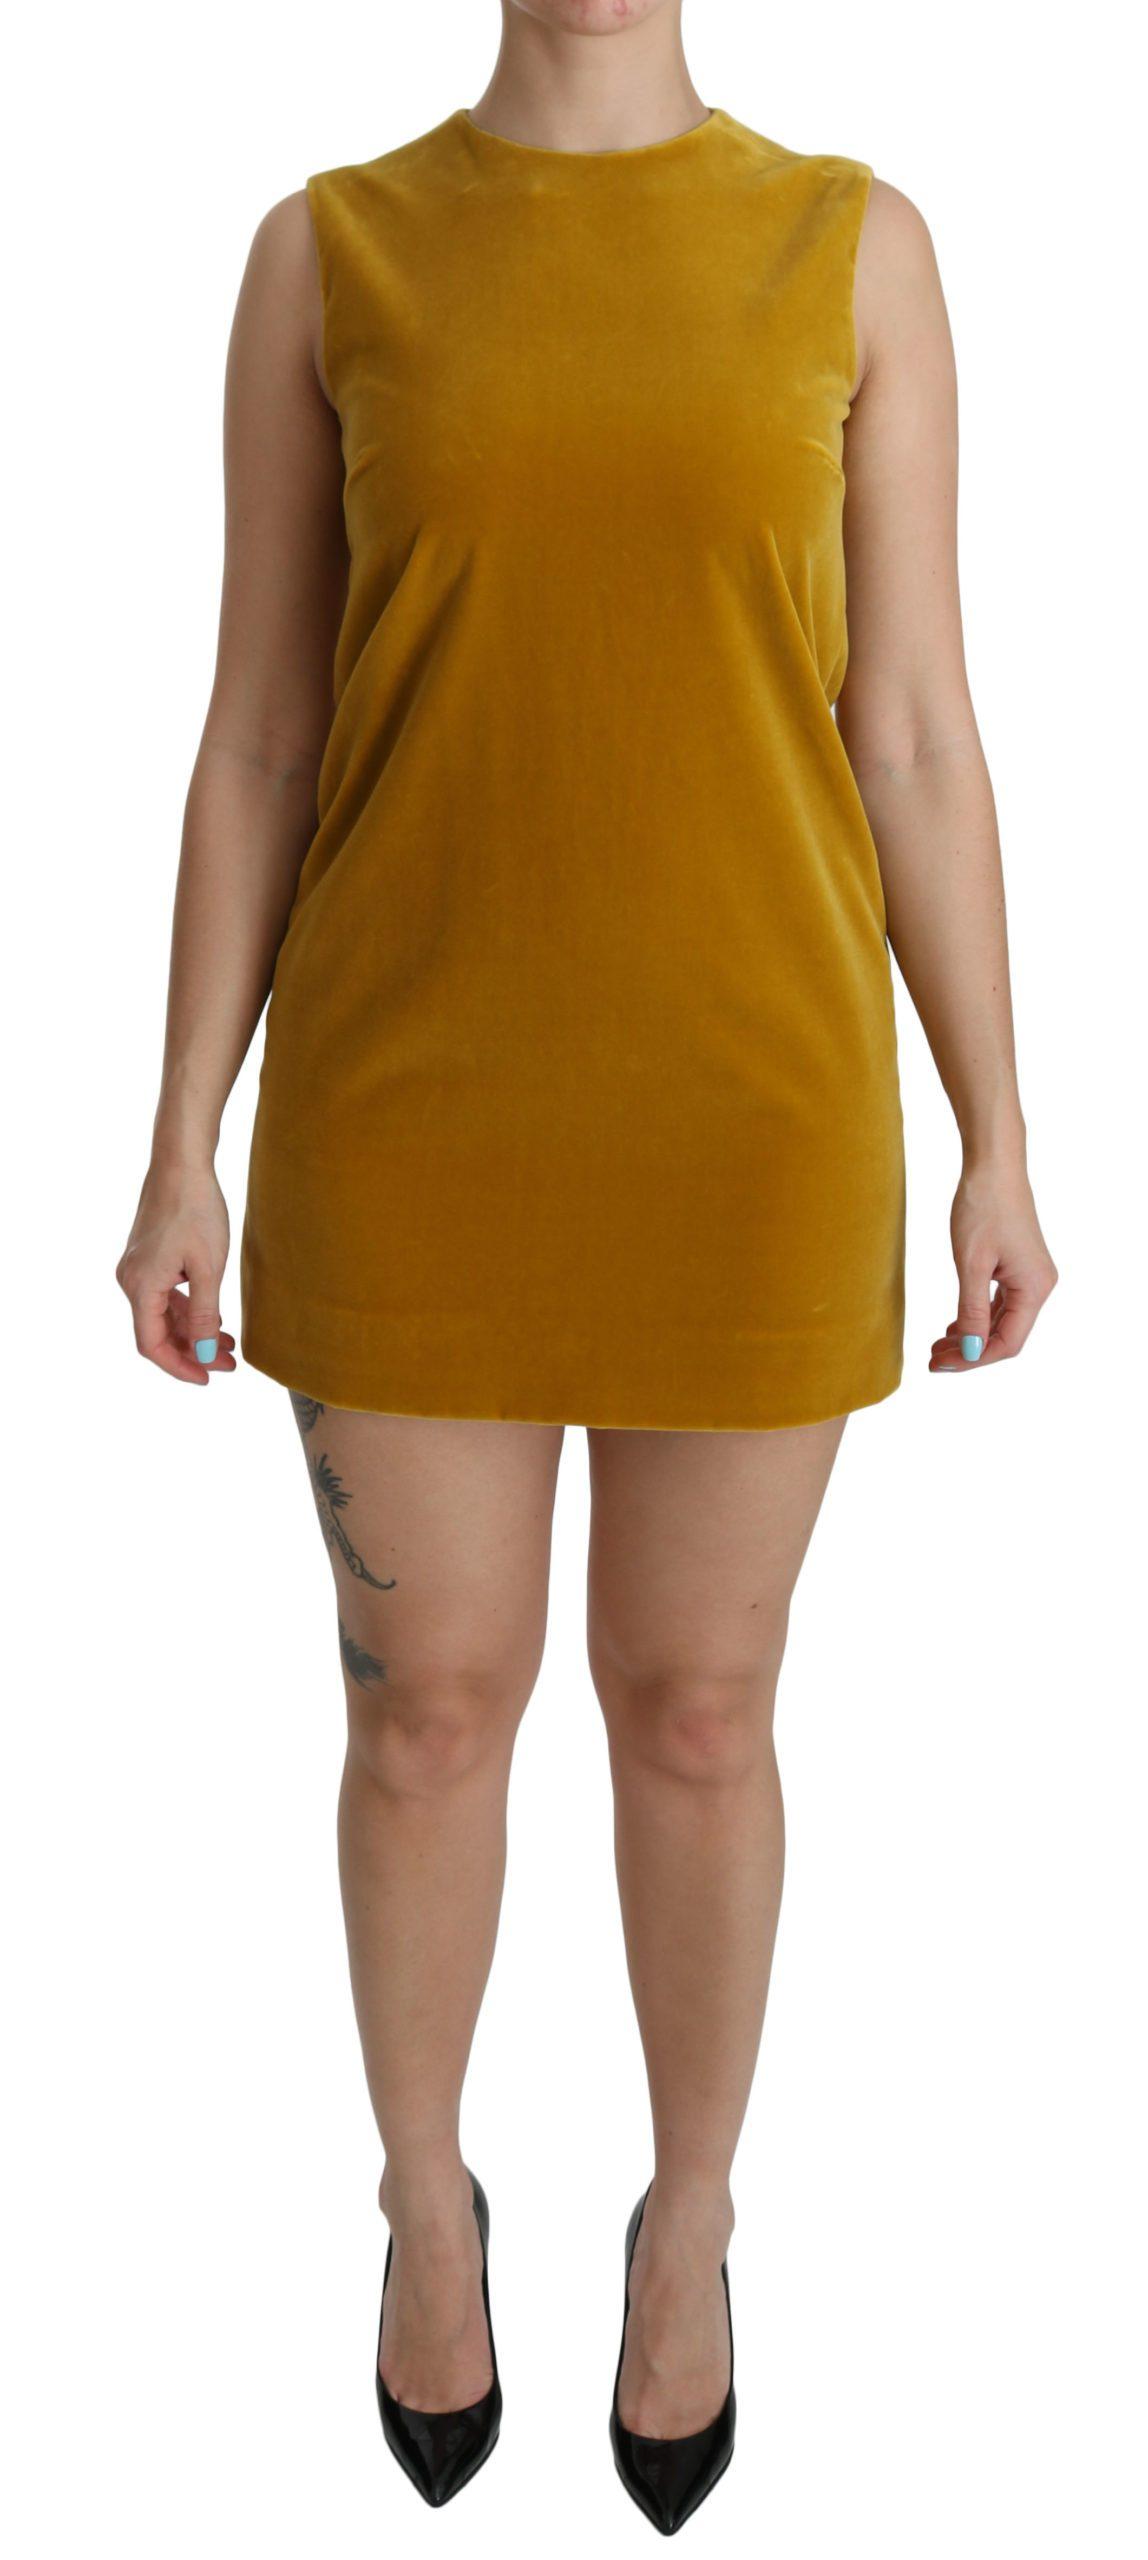 Dolce & Gabbana Women's Stretch Shift Mini Dress Yellow DR2089 - IT40 S